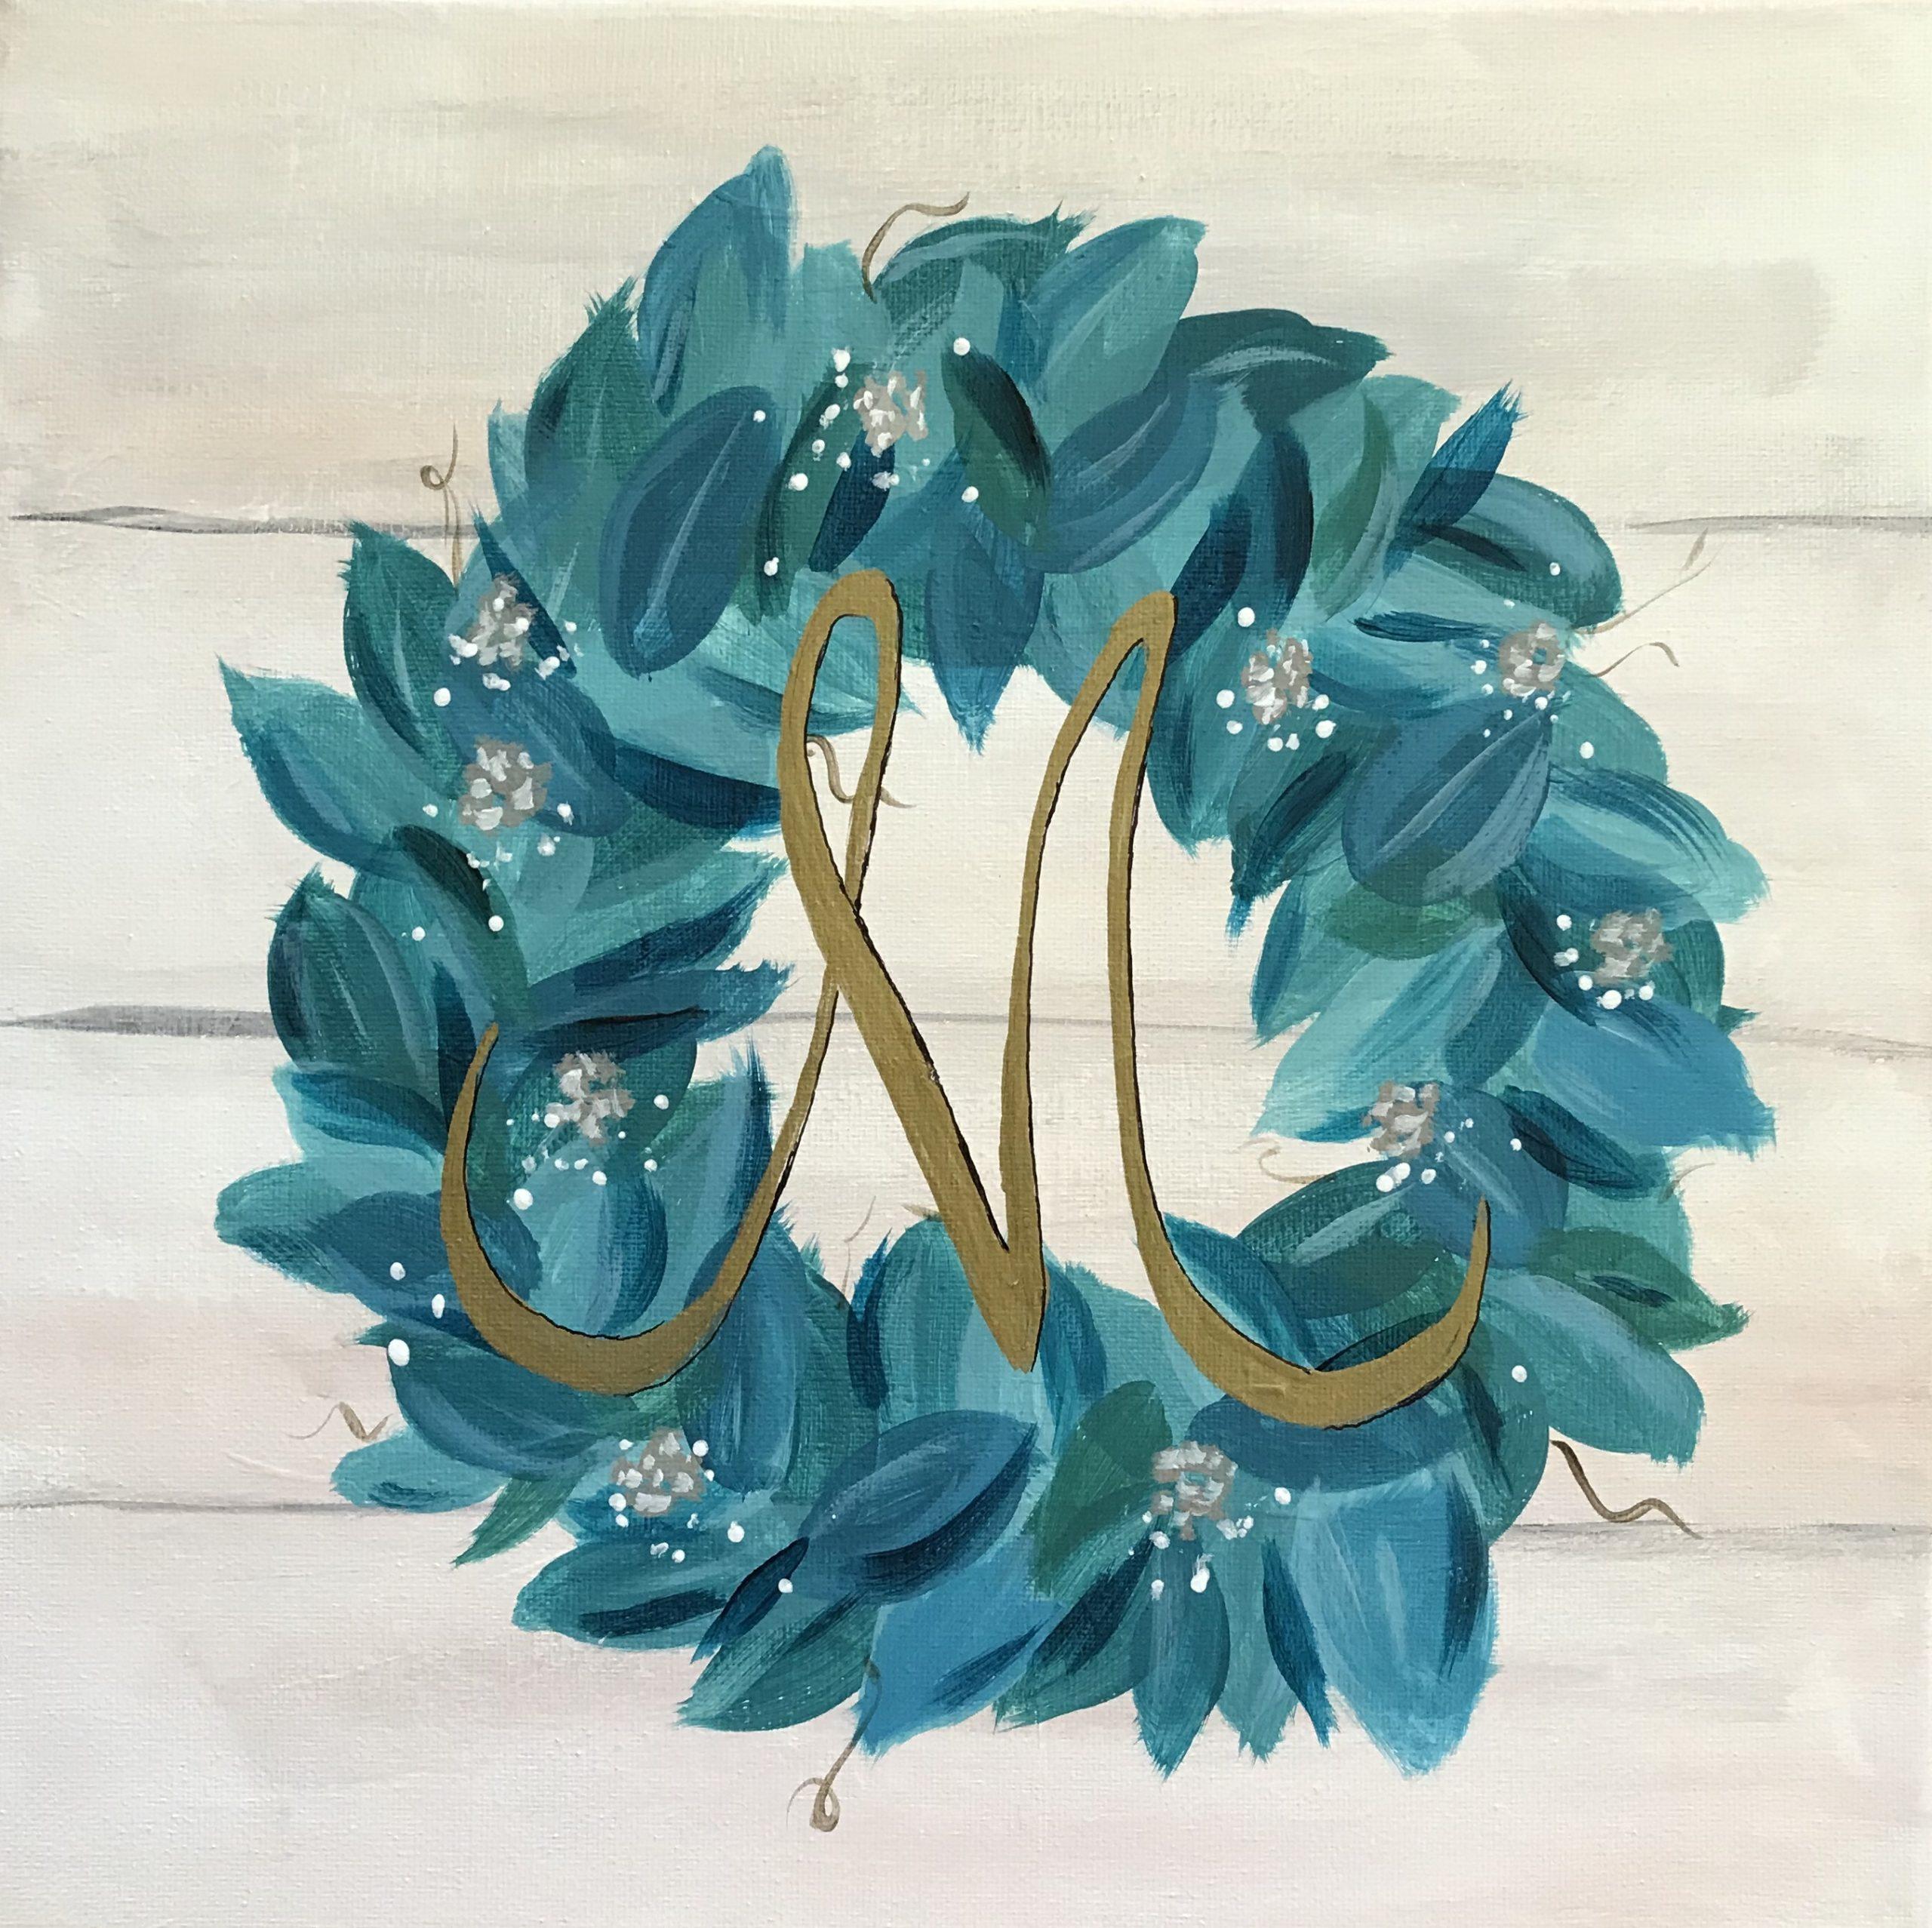 Holiday Acrylic Painting Workshop For Adults Monogram Wreath Mckee Botanical Garden